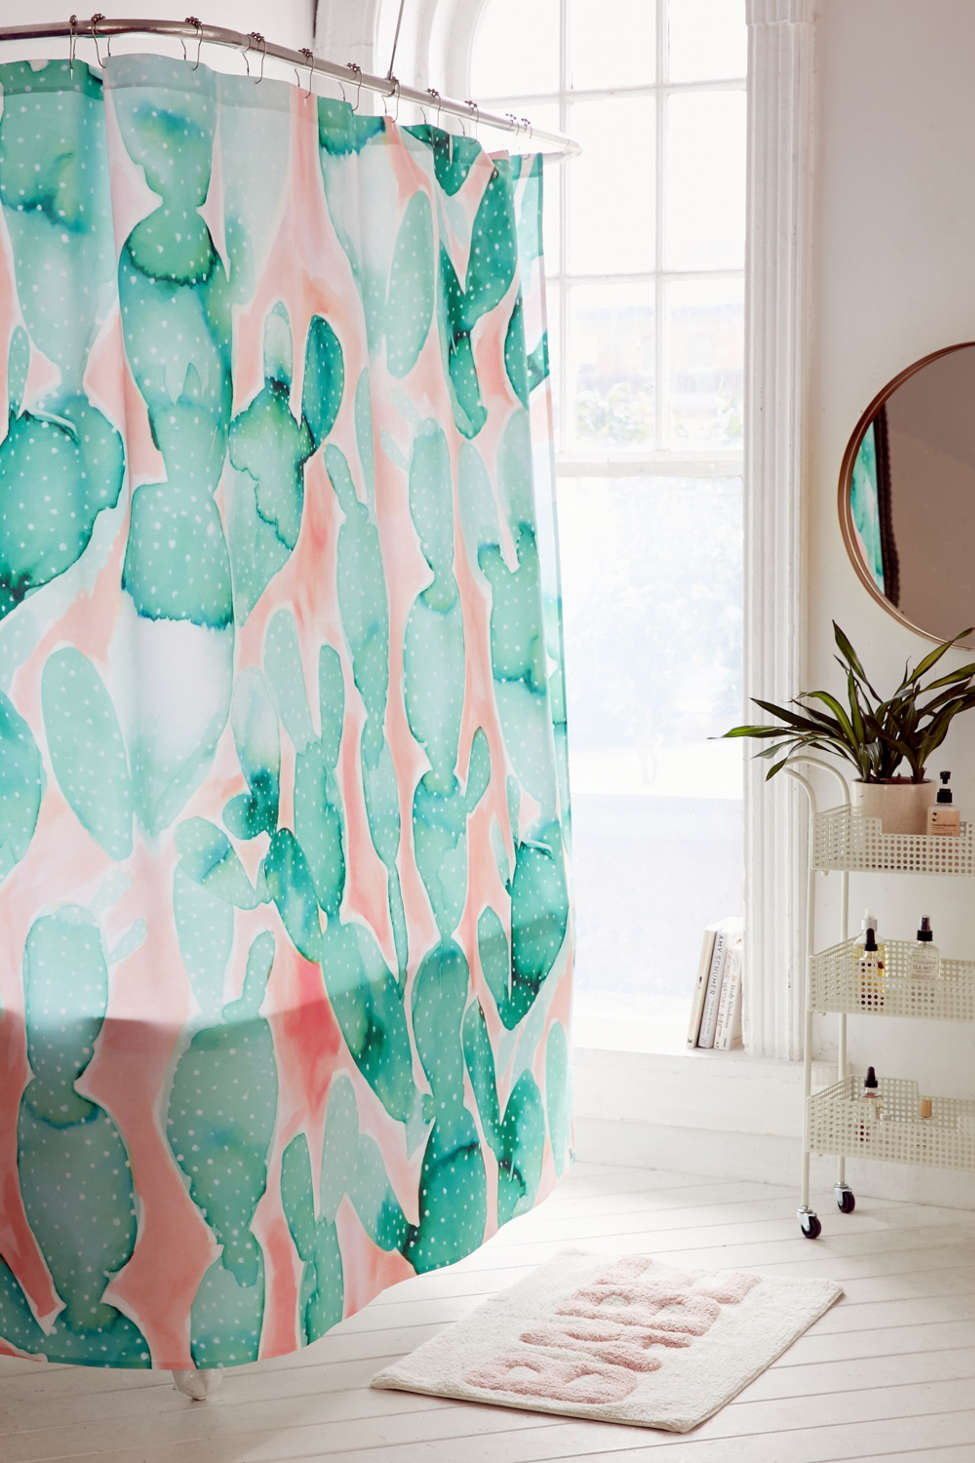 Slide View: 1: Jacqueline Maldonado For Deny Paddle Cactus Shower Curtain